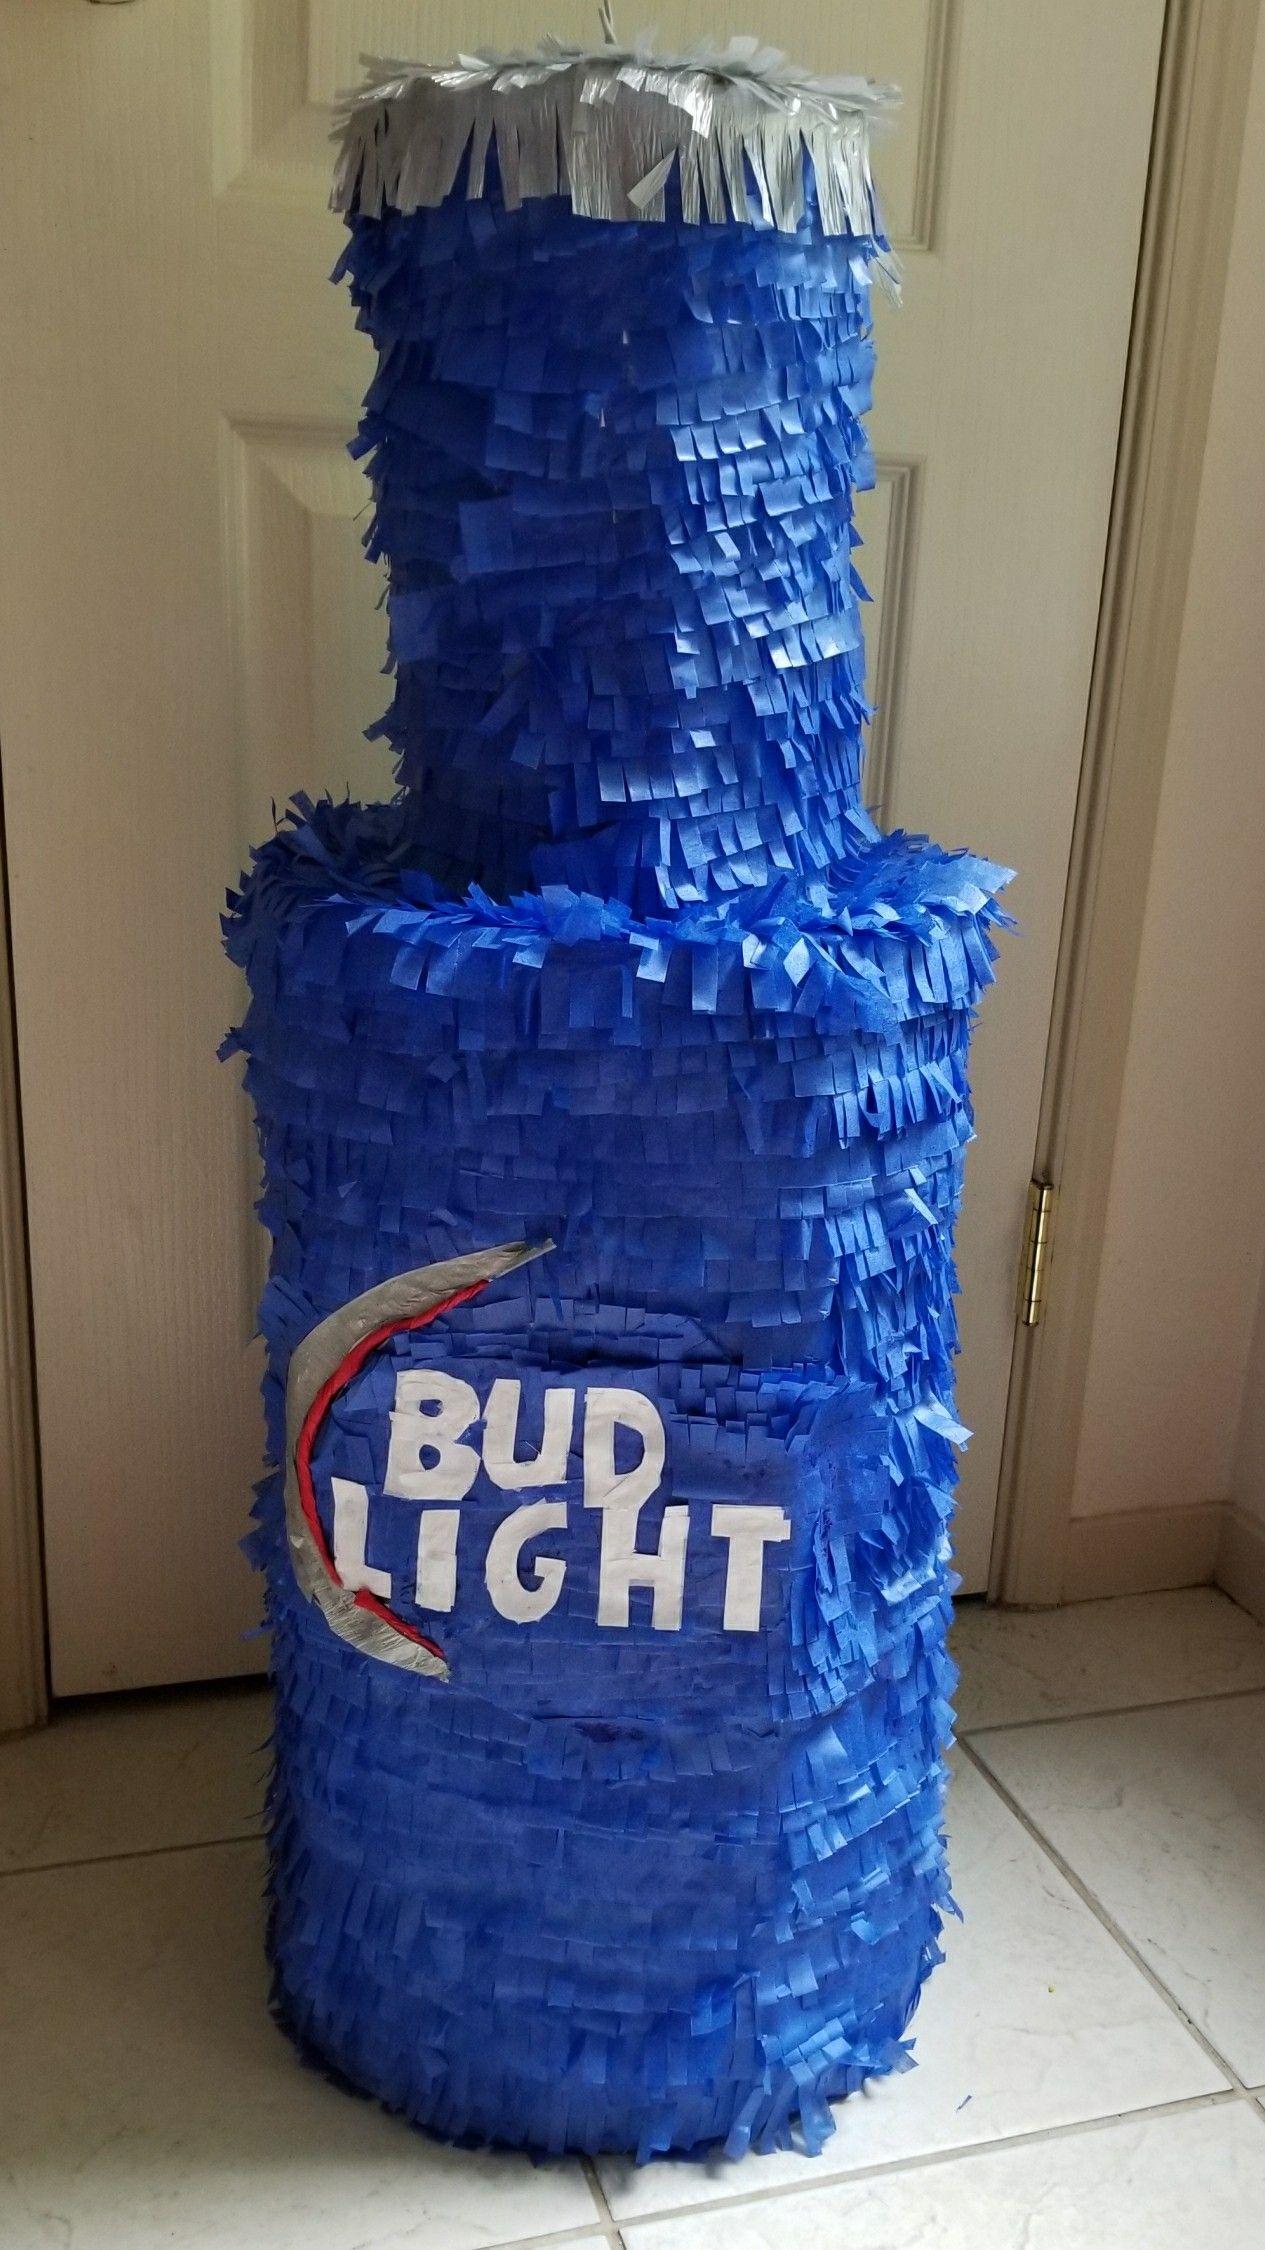 40 40oz Budlight light Bottle pinata Bud